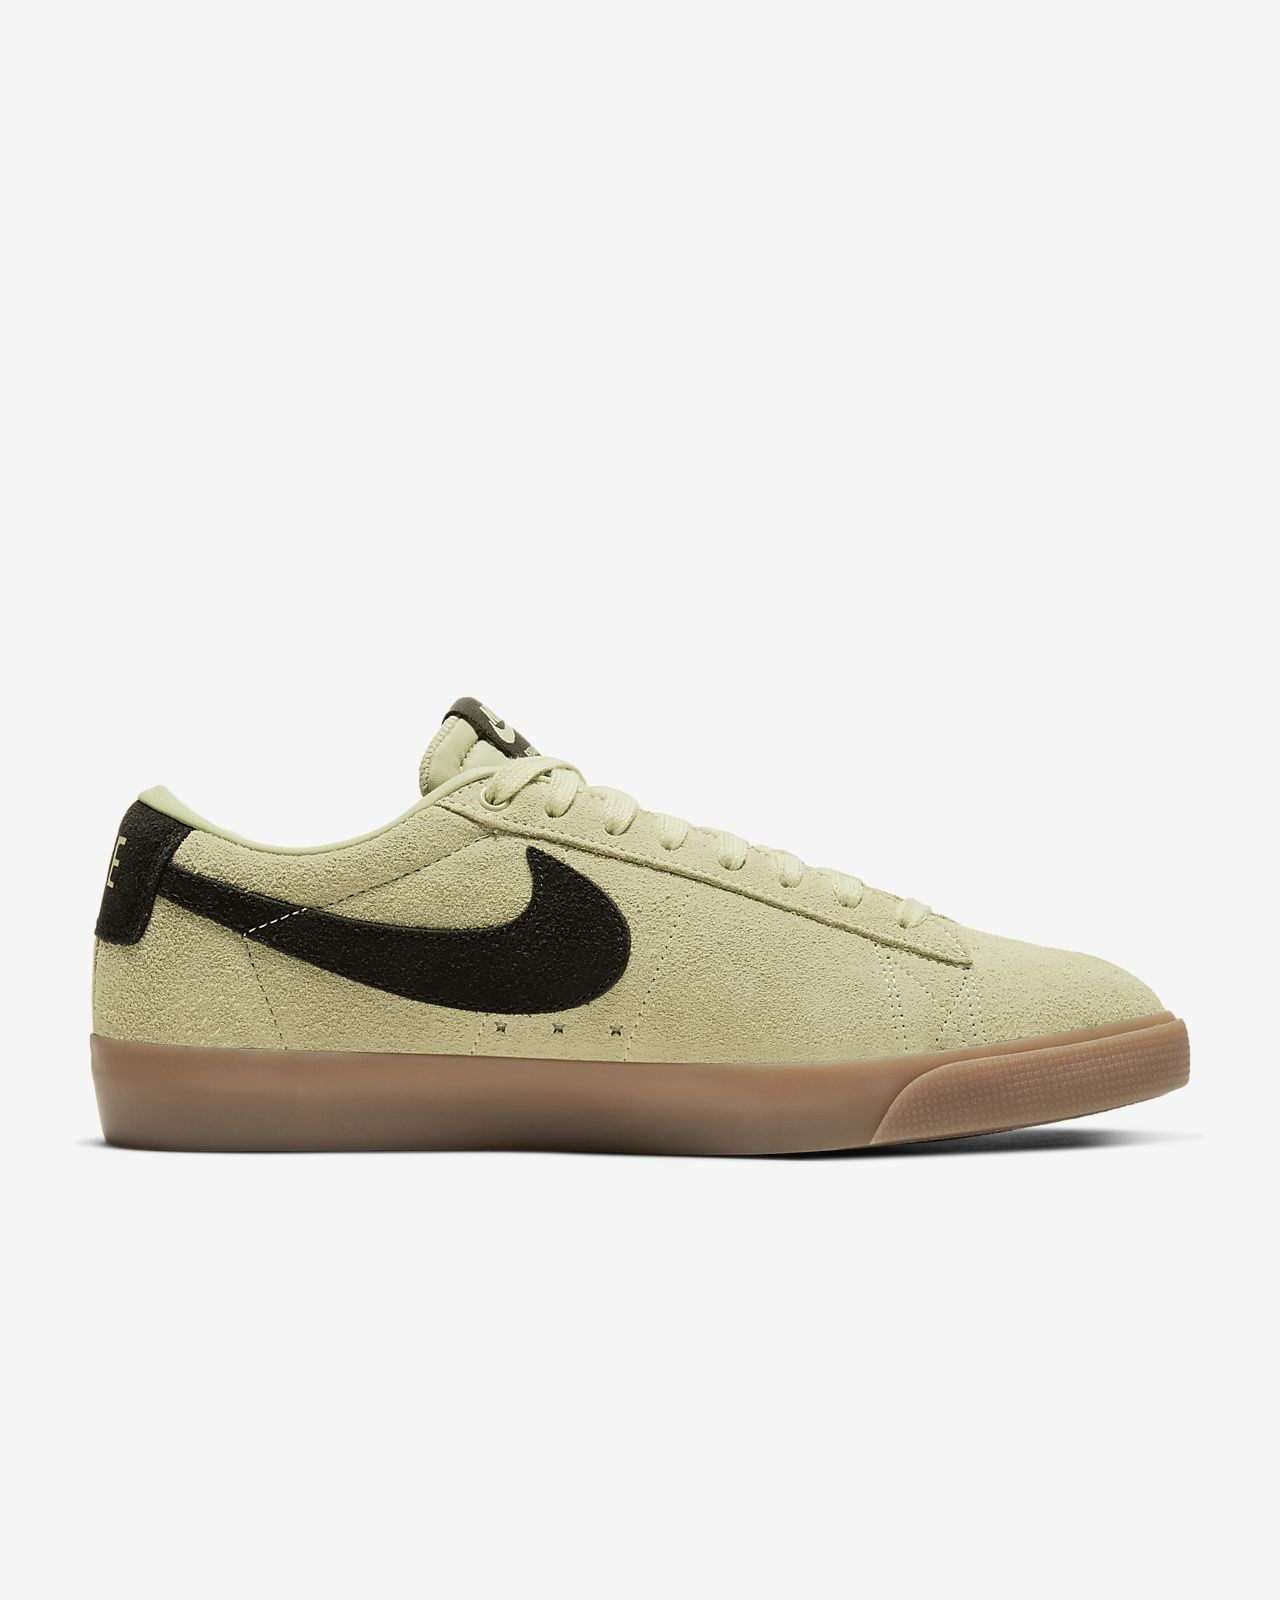 Nike SB Blazer Low GT skatersko